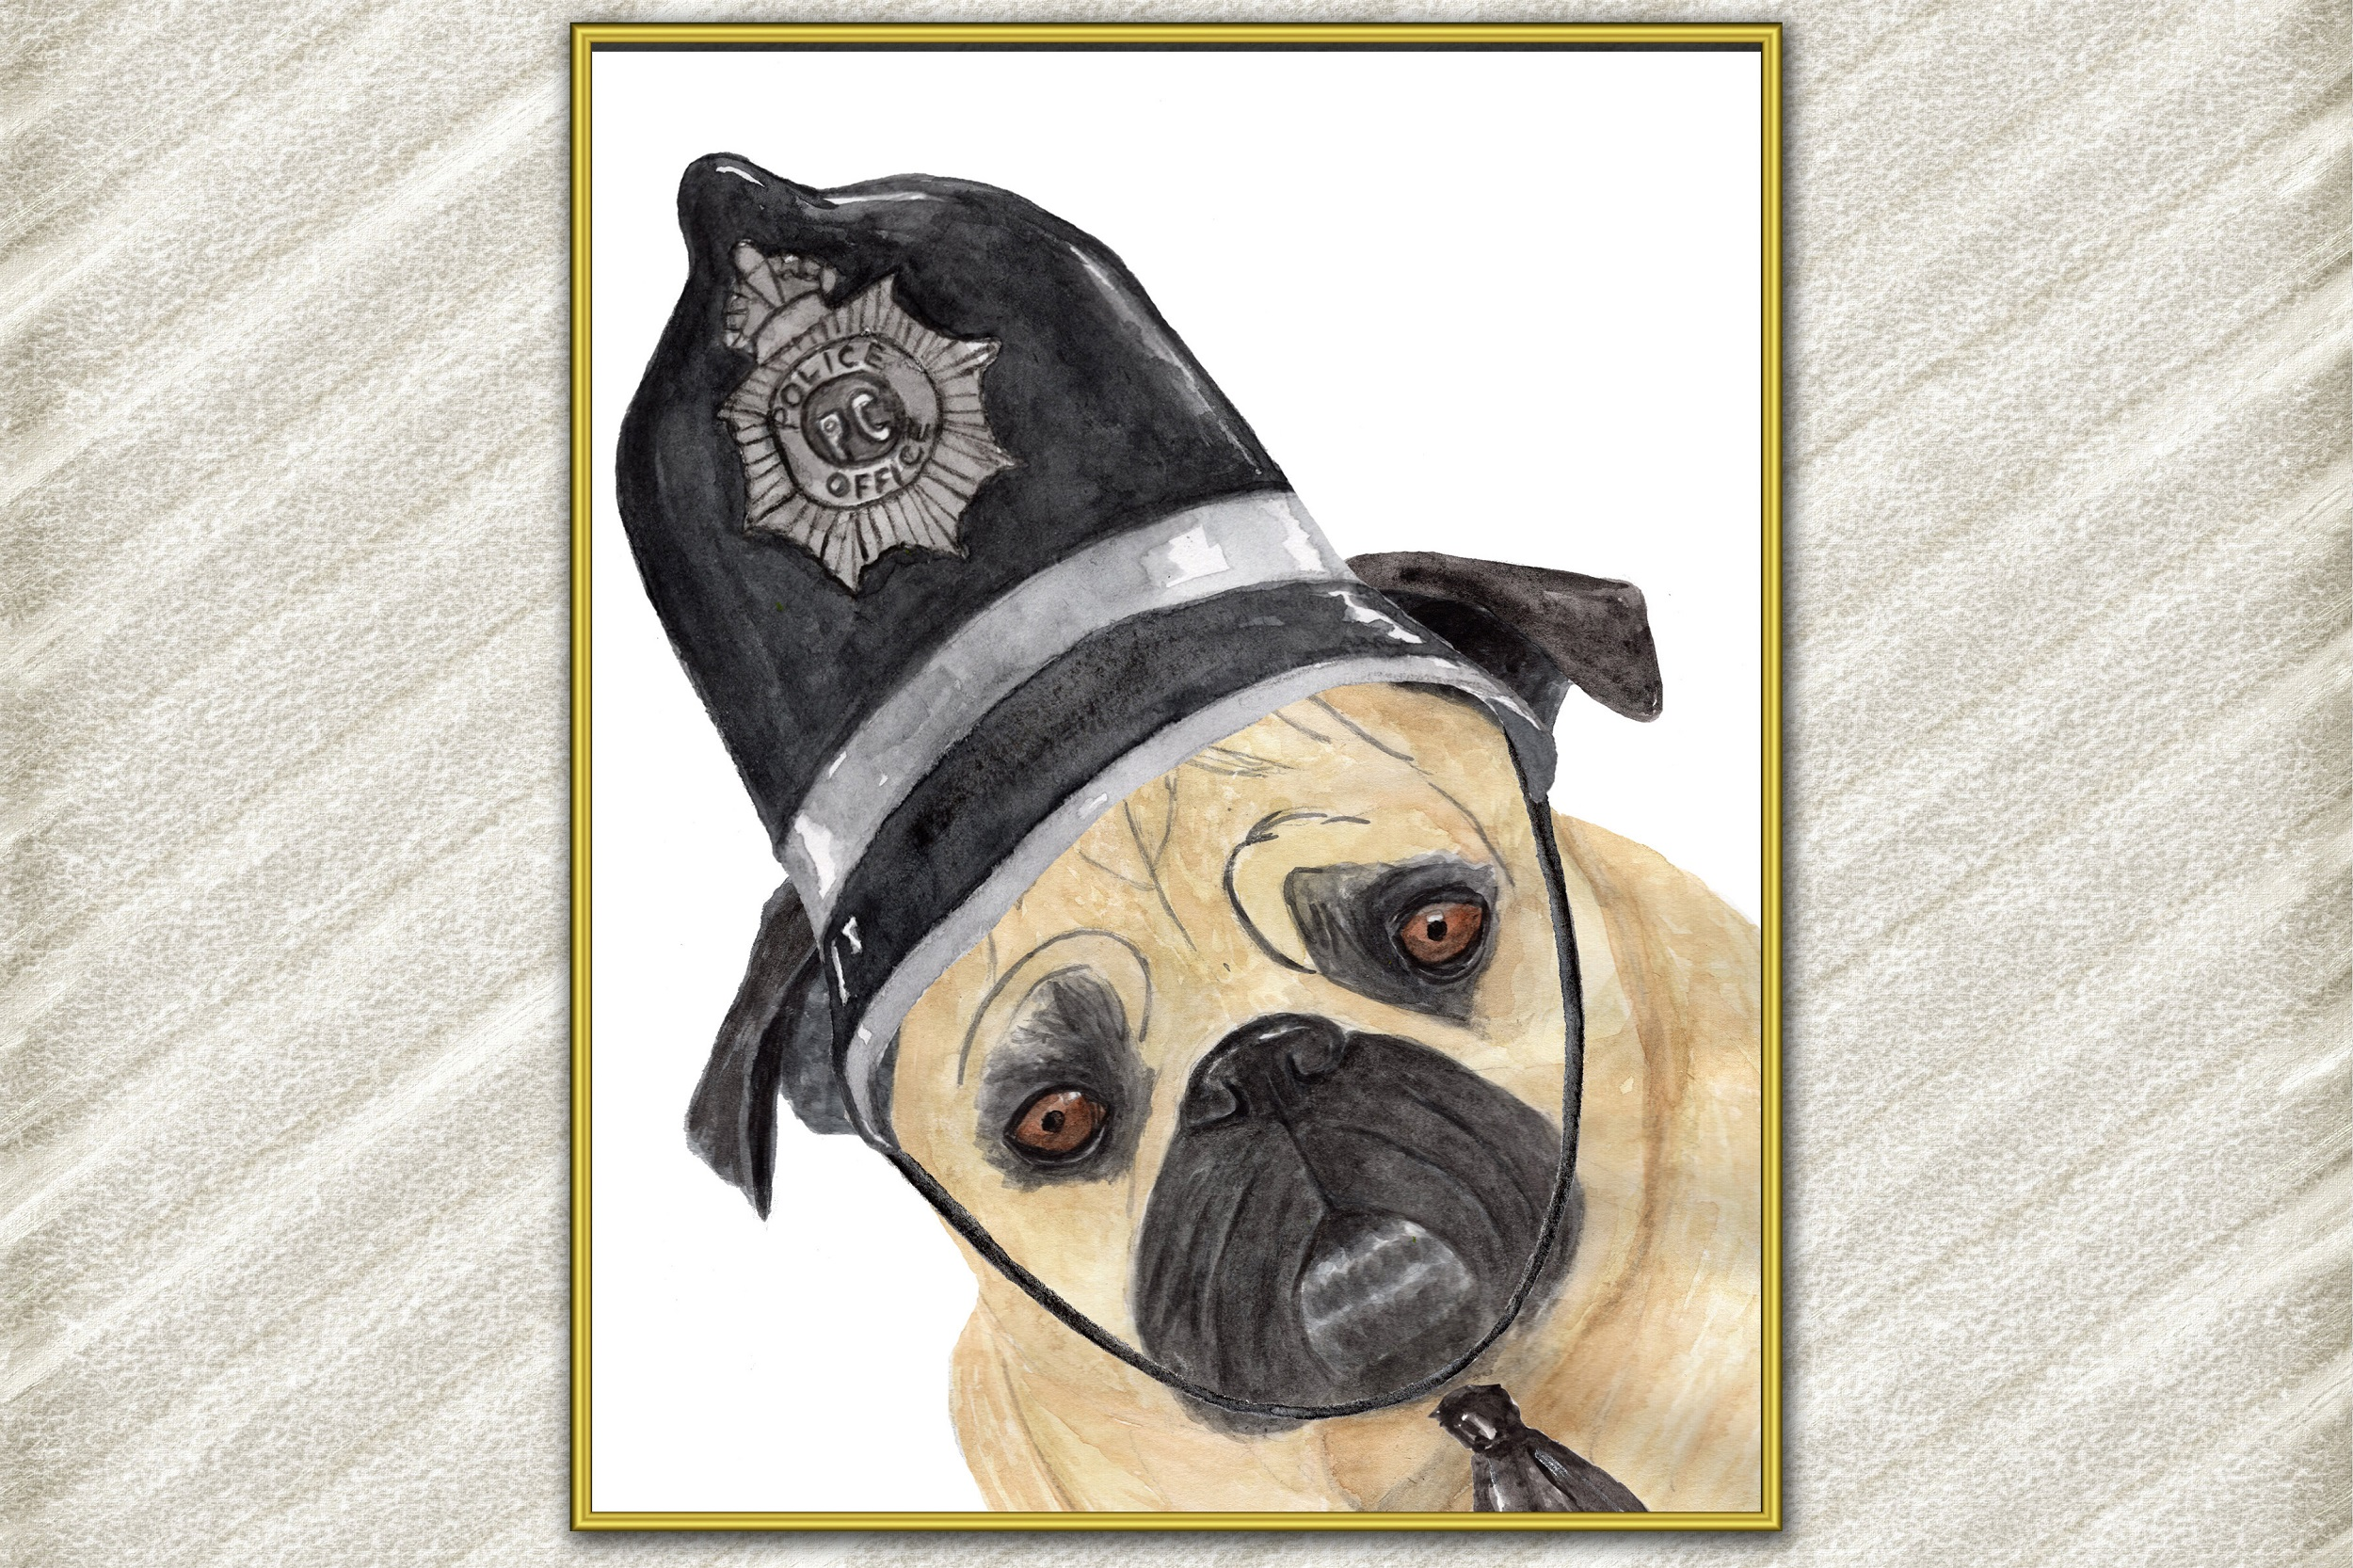 Pug art print , Cute pets prints,Mops poster Funny dog print example image 1